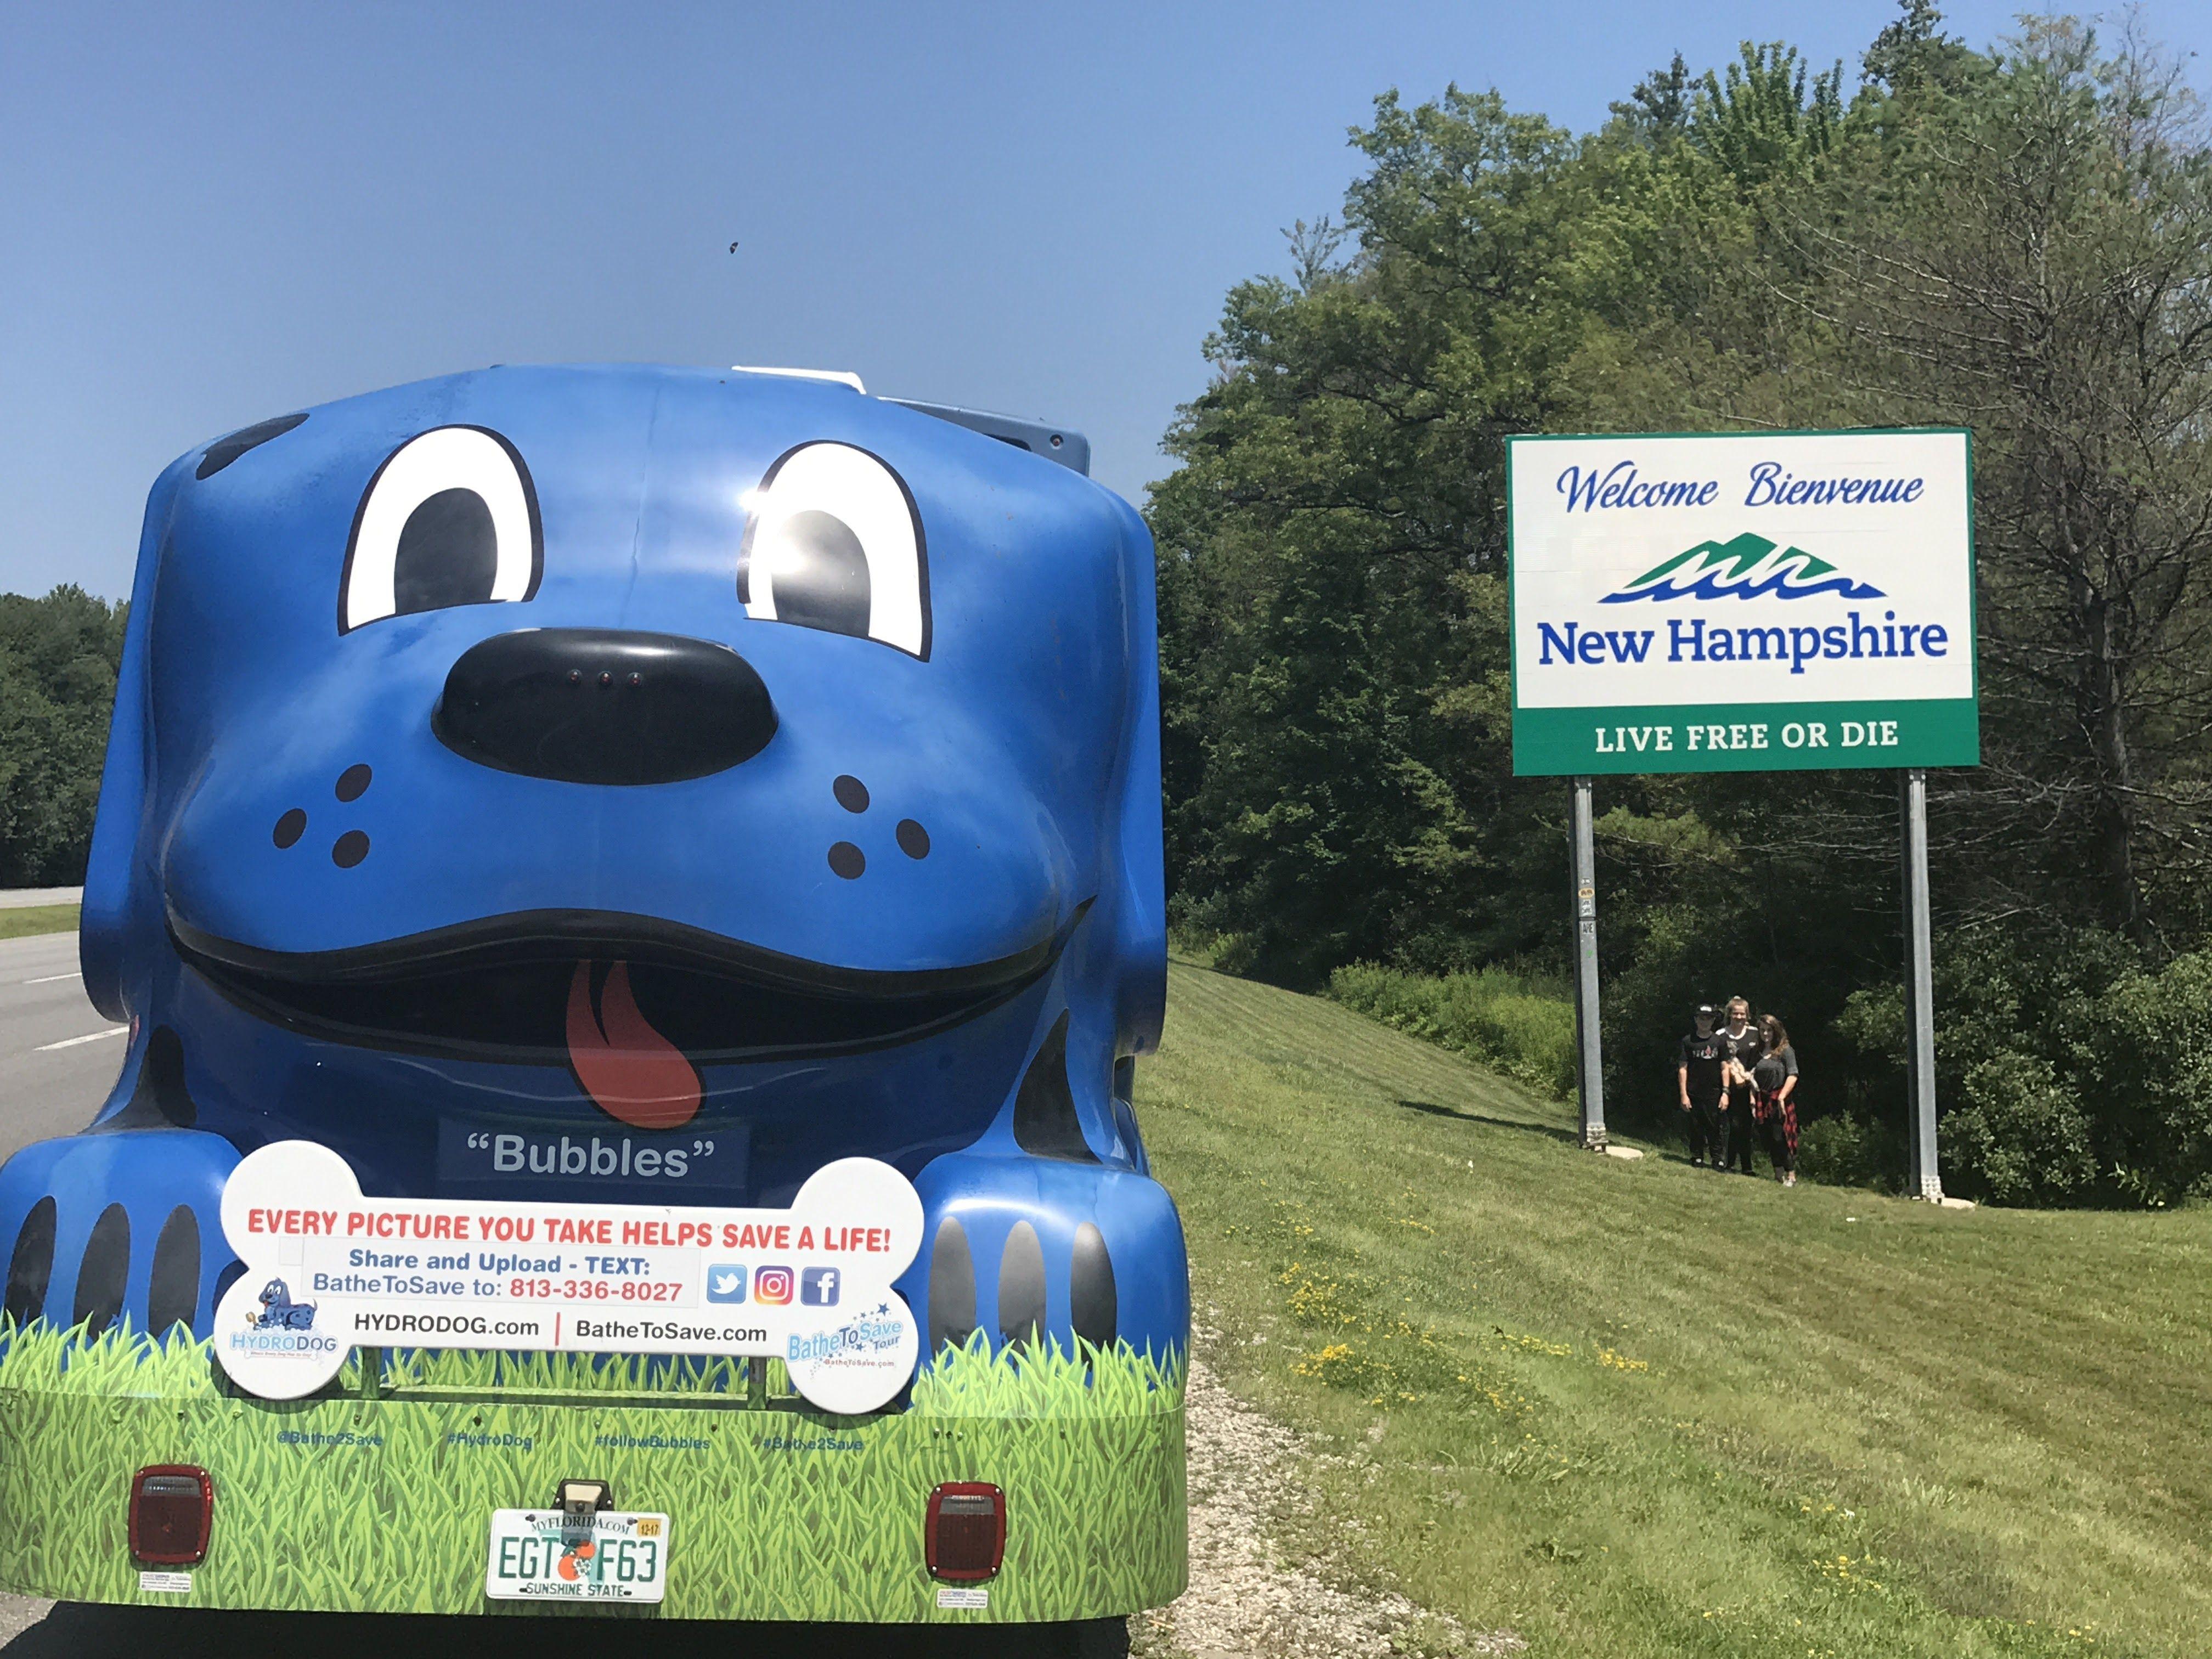 New Hampshire hydrodog dogs bathetosave tour